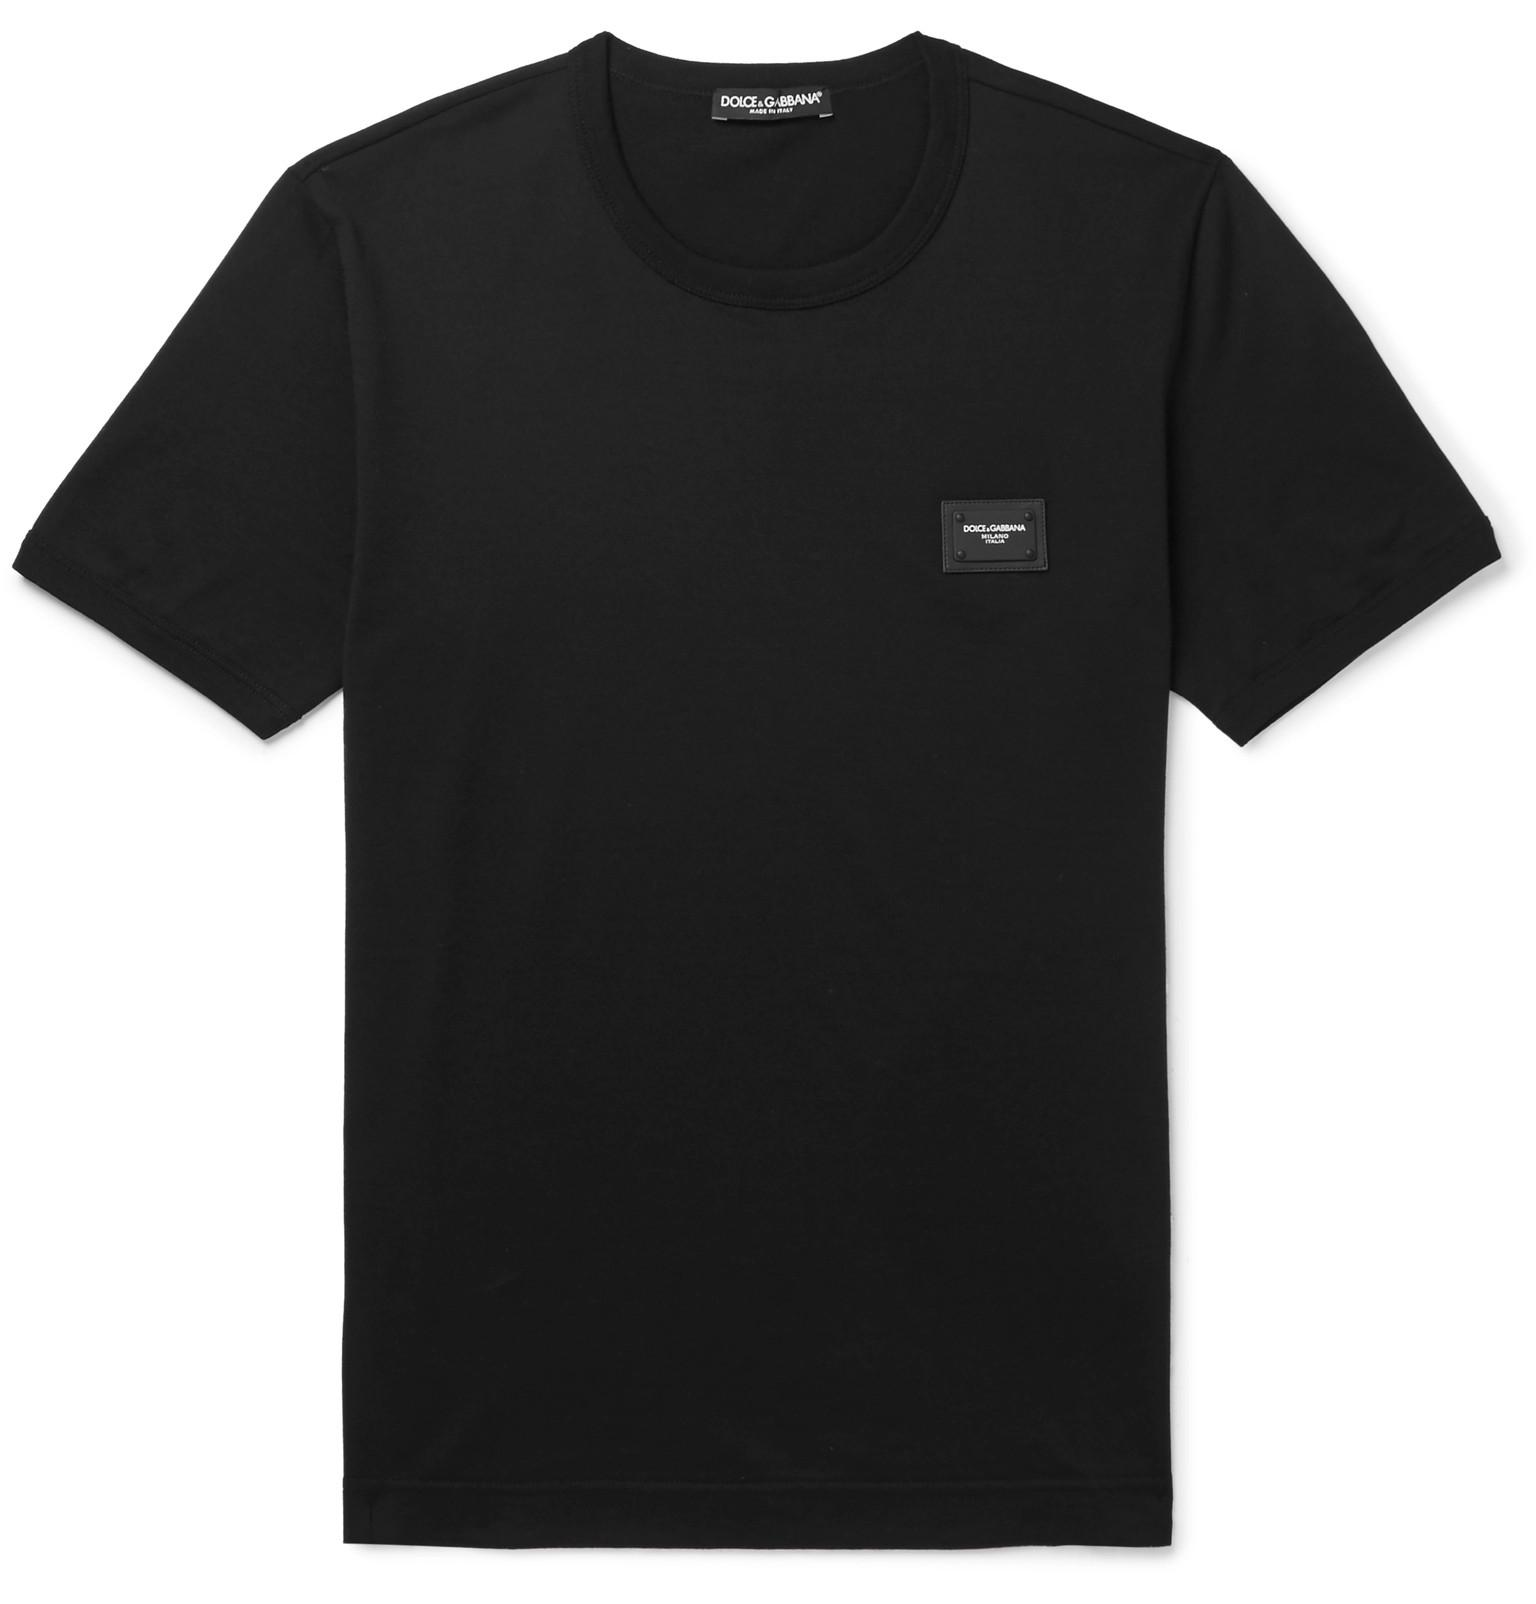 Appliquéd Mélange Cotton-jersey T-shirt Dolce & Gabbana Outlet Discount Sale Buy Cheap Fast Delivery Good Selling Online 2XcYTctTn